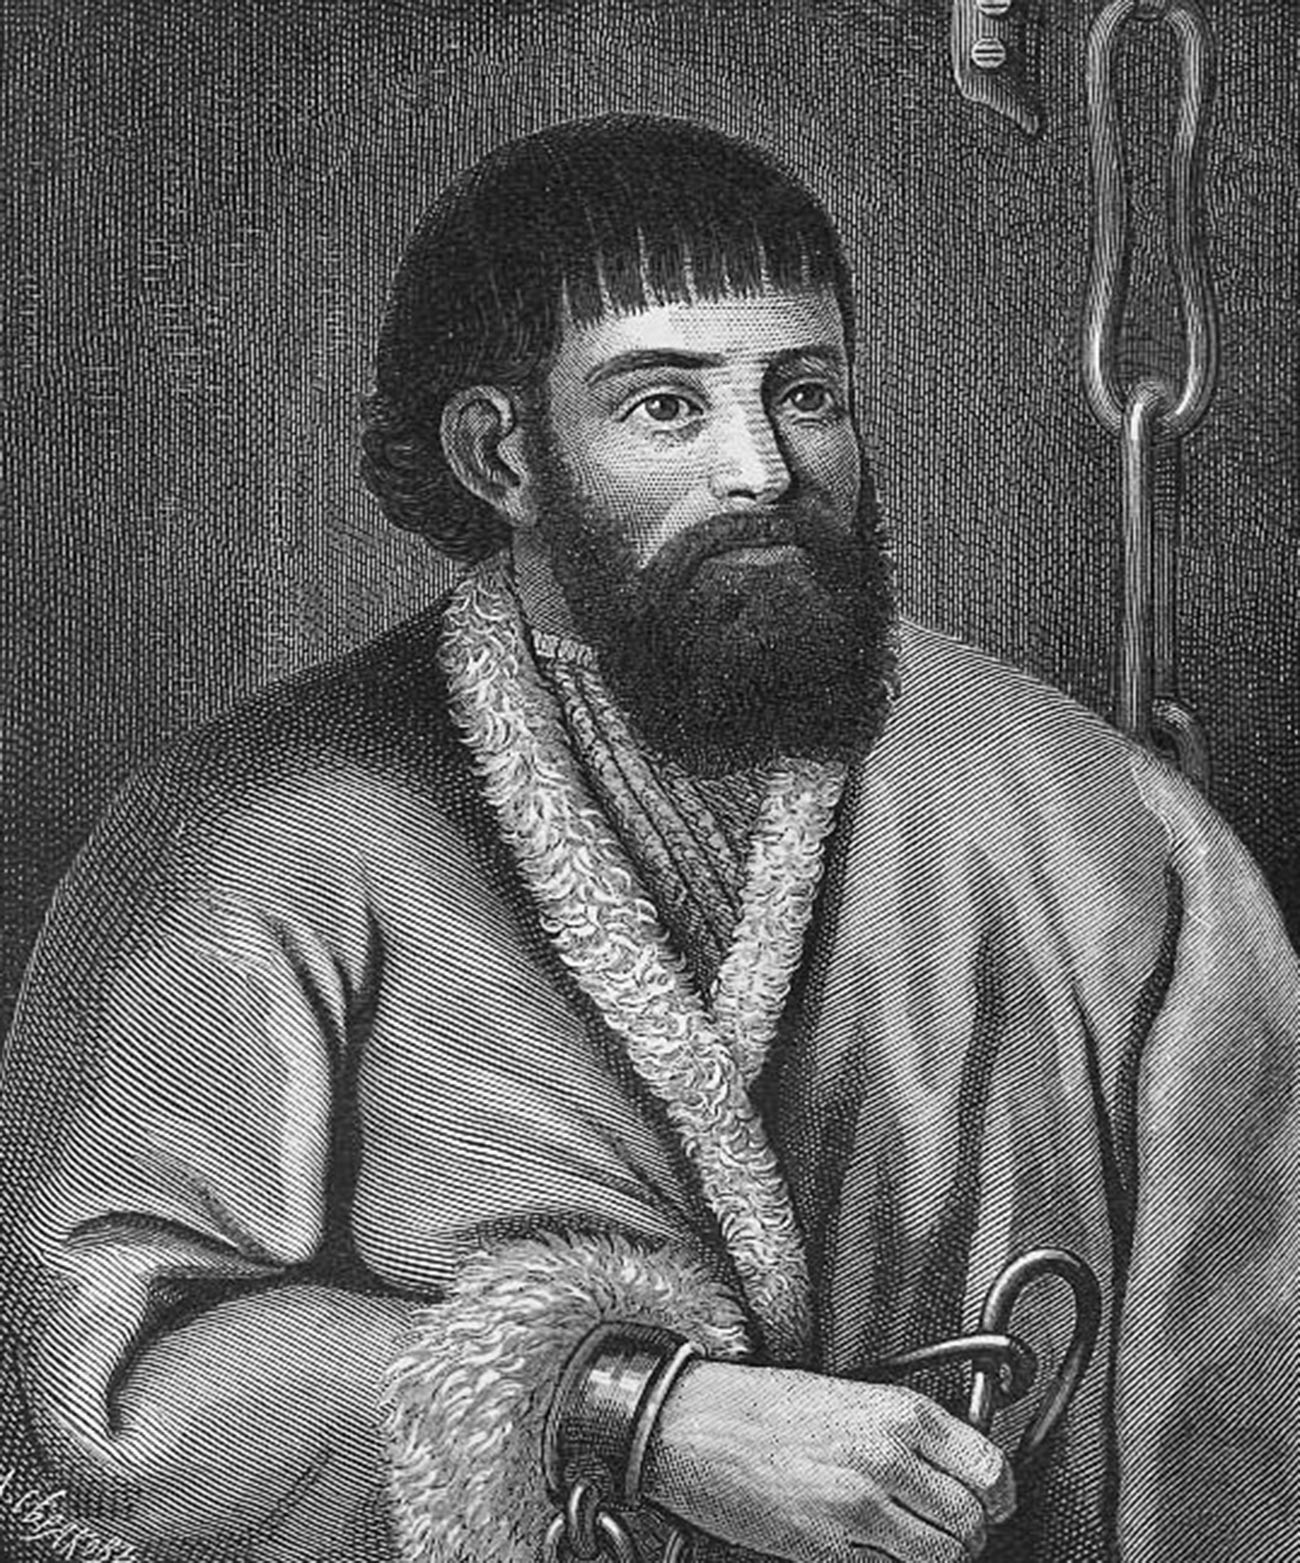 Jemeljan Pugačov